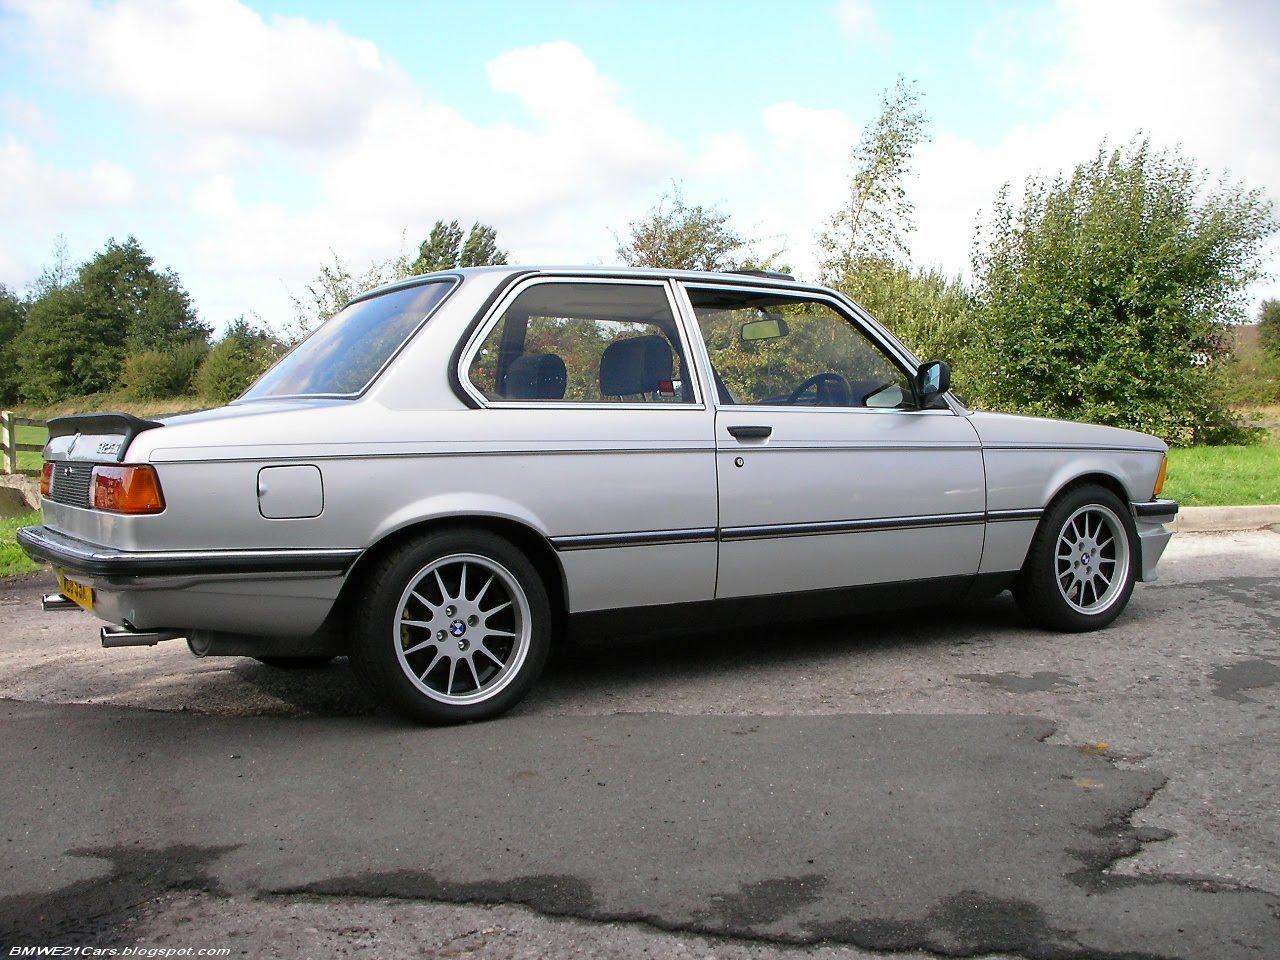 http://1.bp.blogspot.com/_9UDz8Dgv1pg/SxL5JOzclpI/AAAAAAAAIHE/K9LB5196-9M/s1600/BMW-E21-323I%20(1).jpg